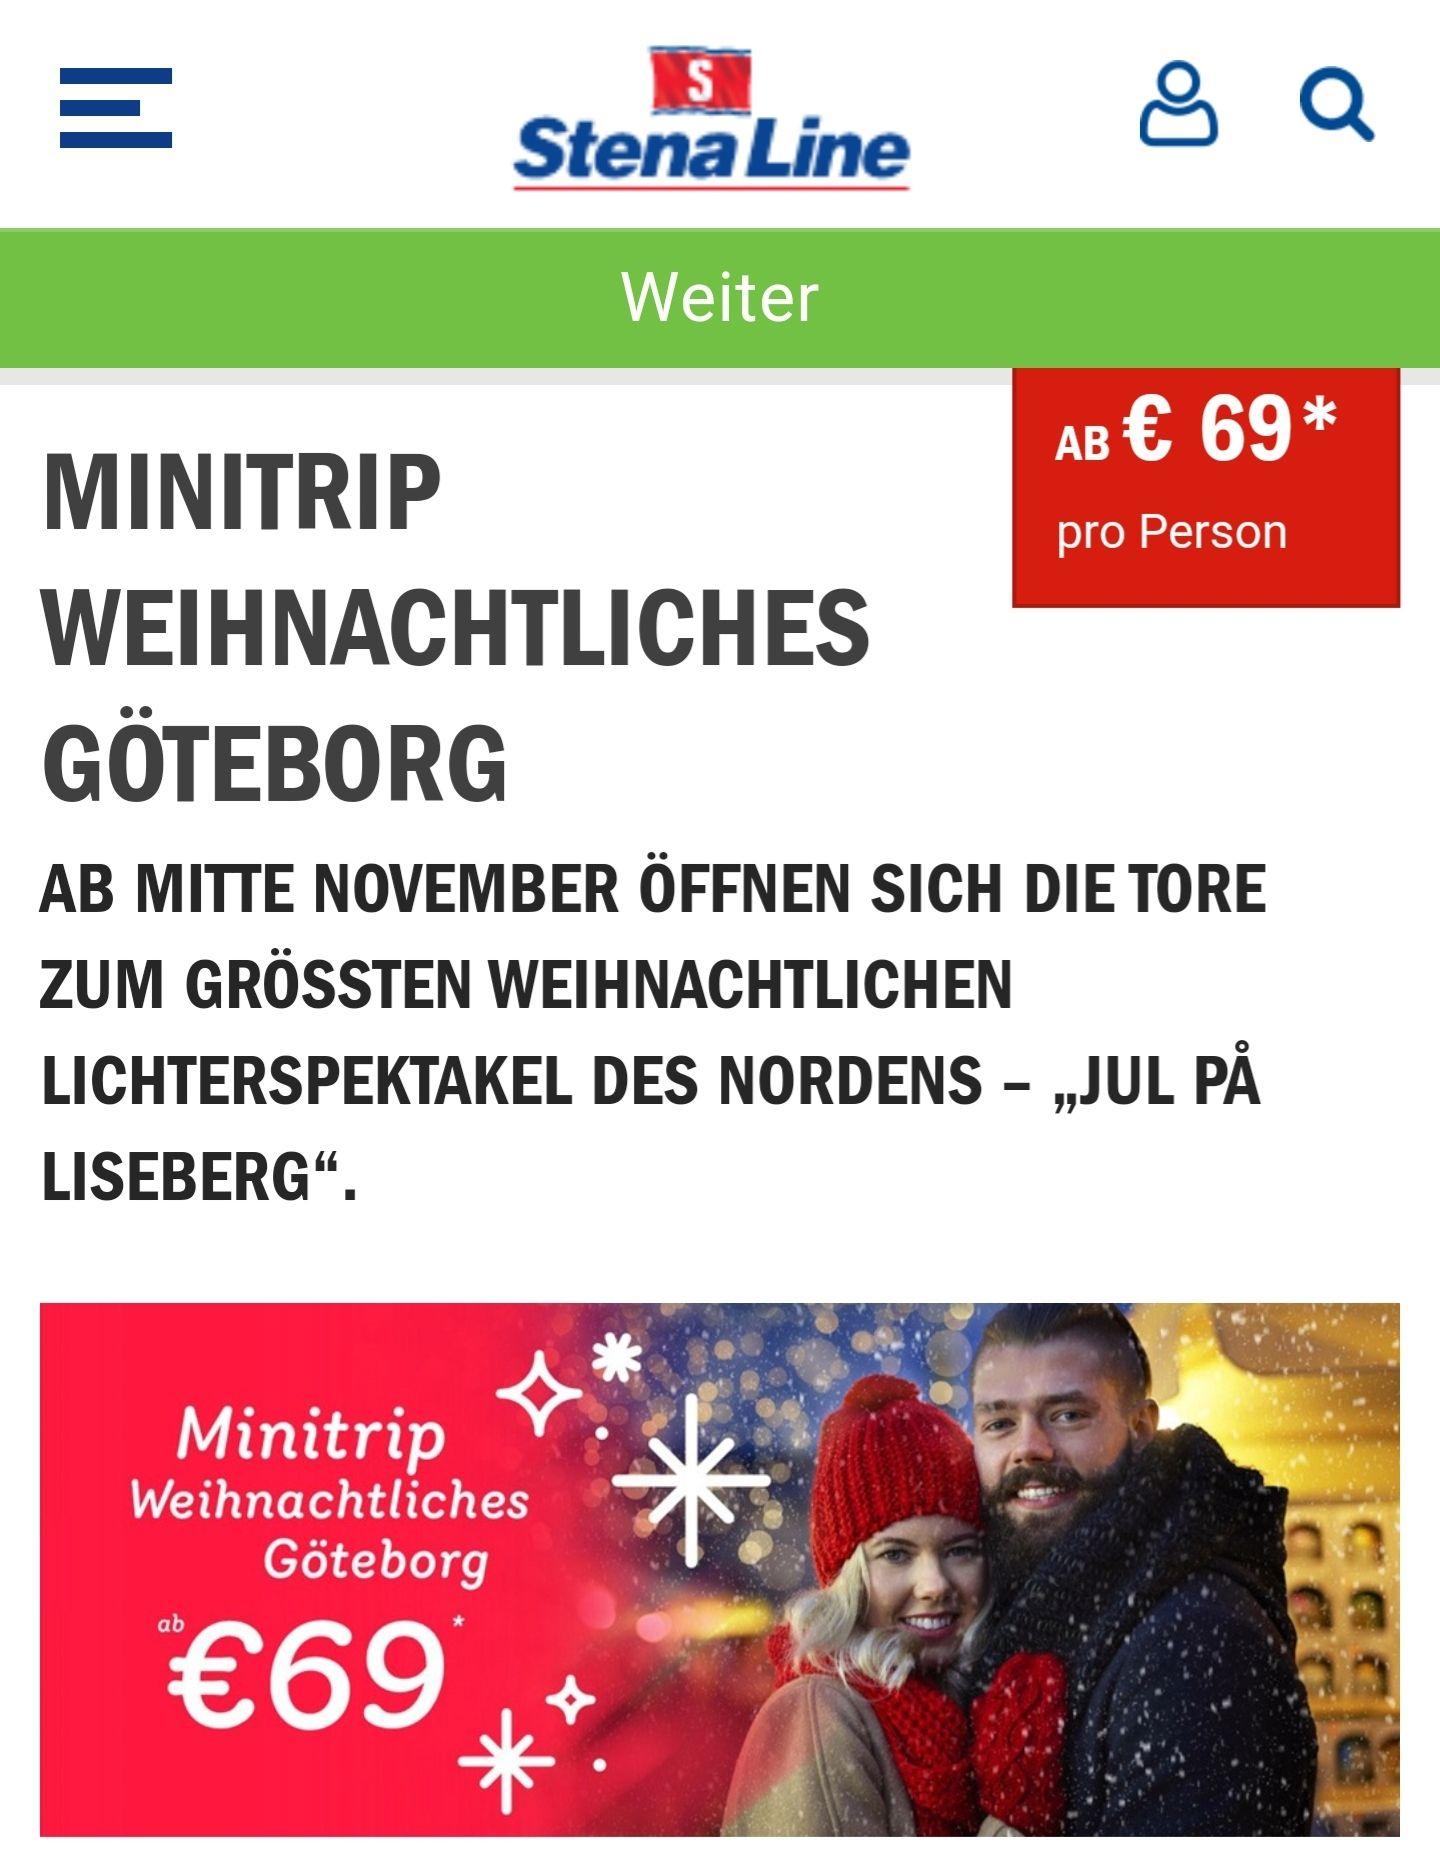 Minitrip mit Stena Line Kiel-Göteborg-Kiel 3Tage ab 69€ p.P.